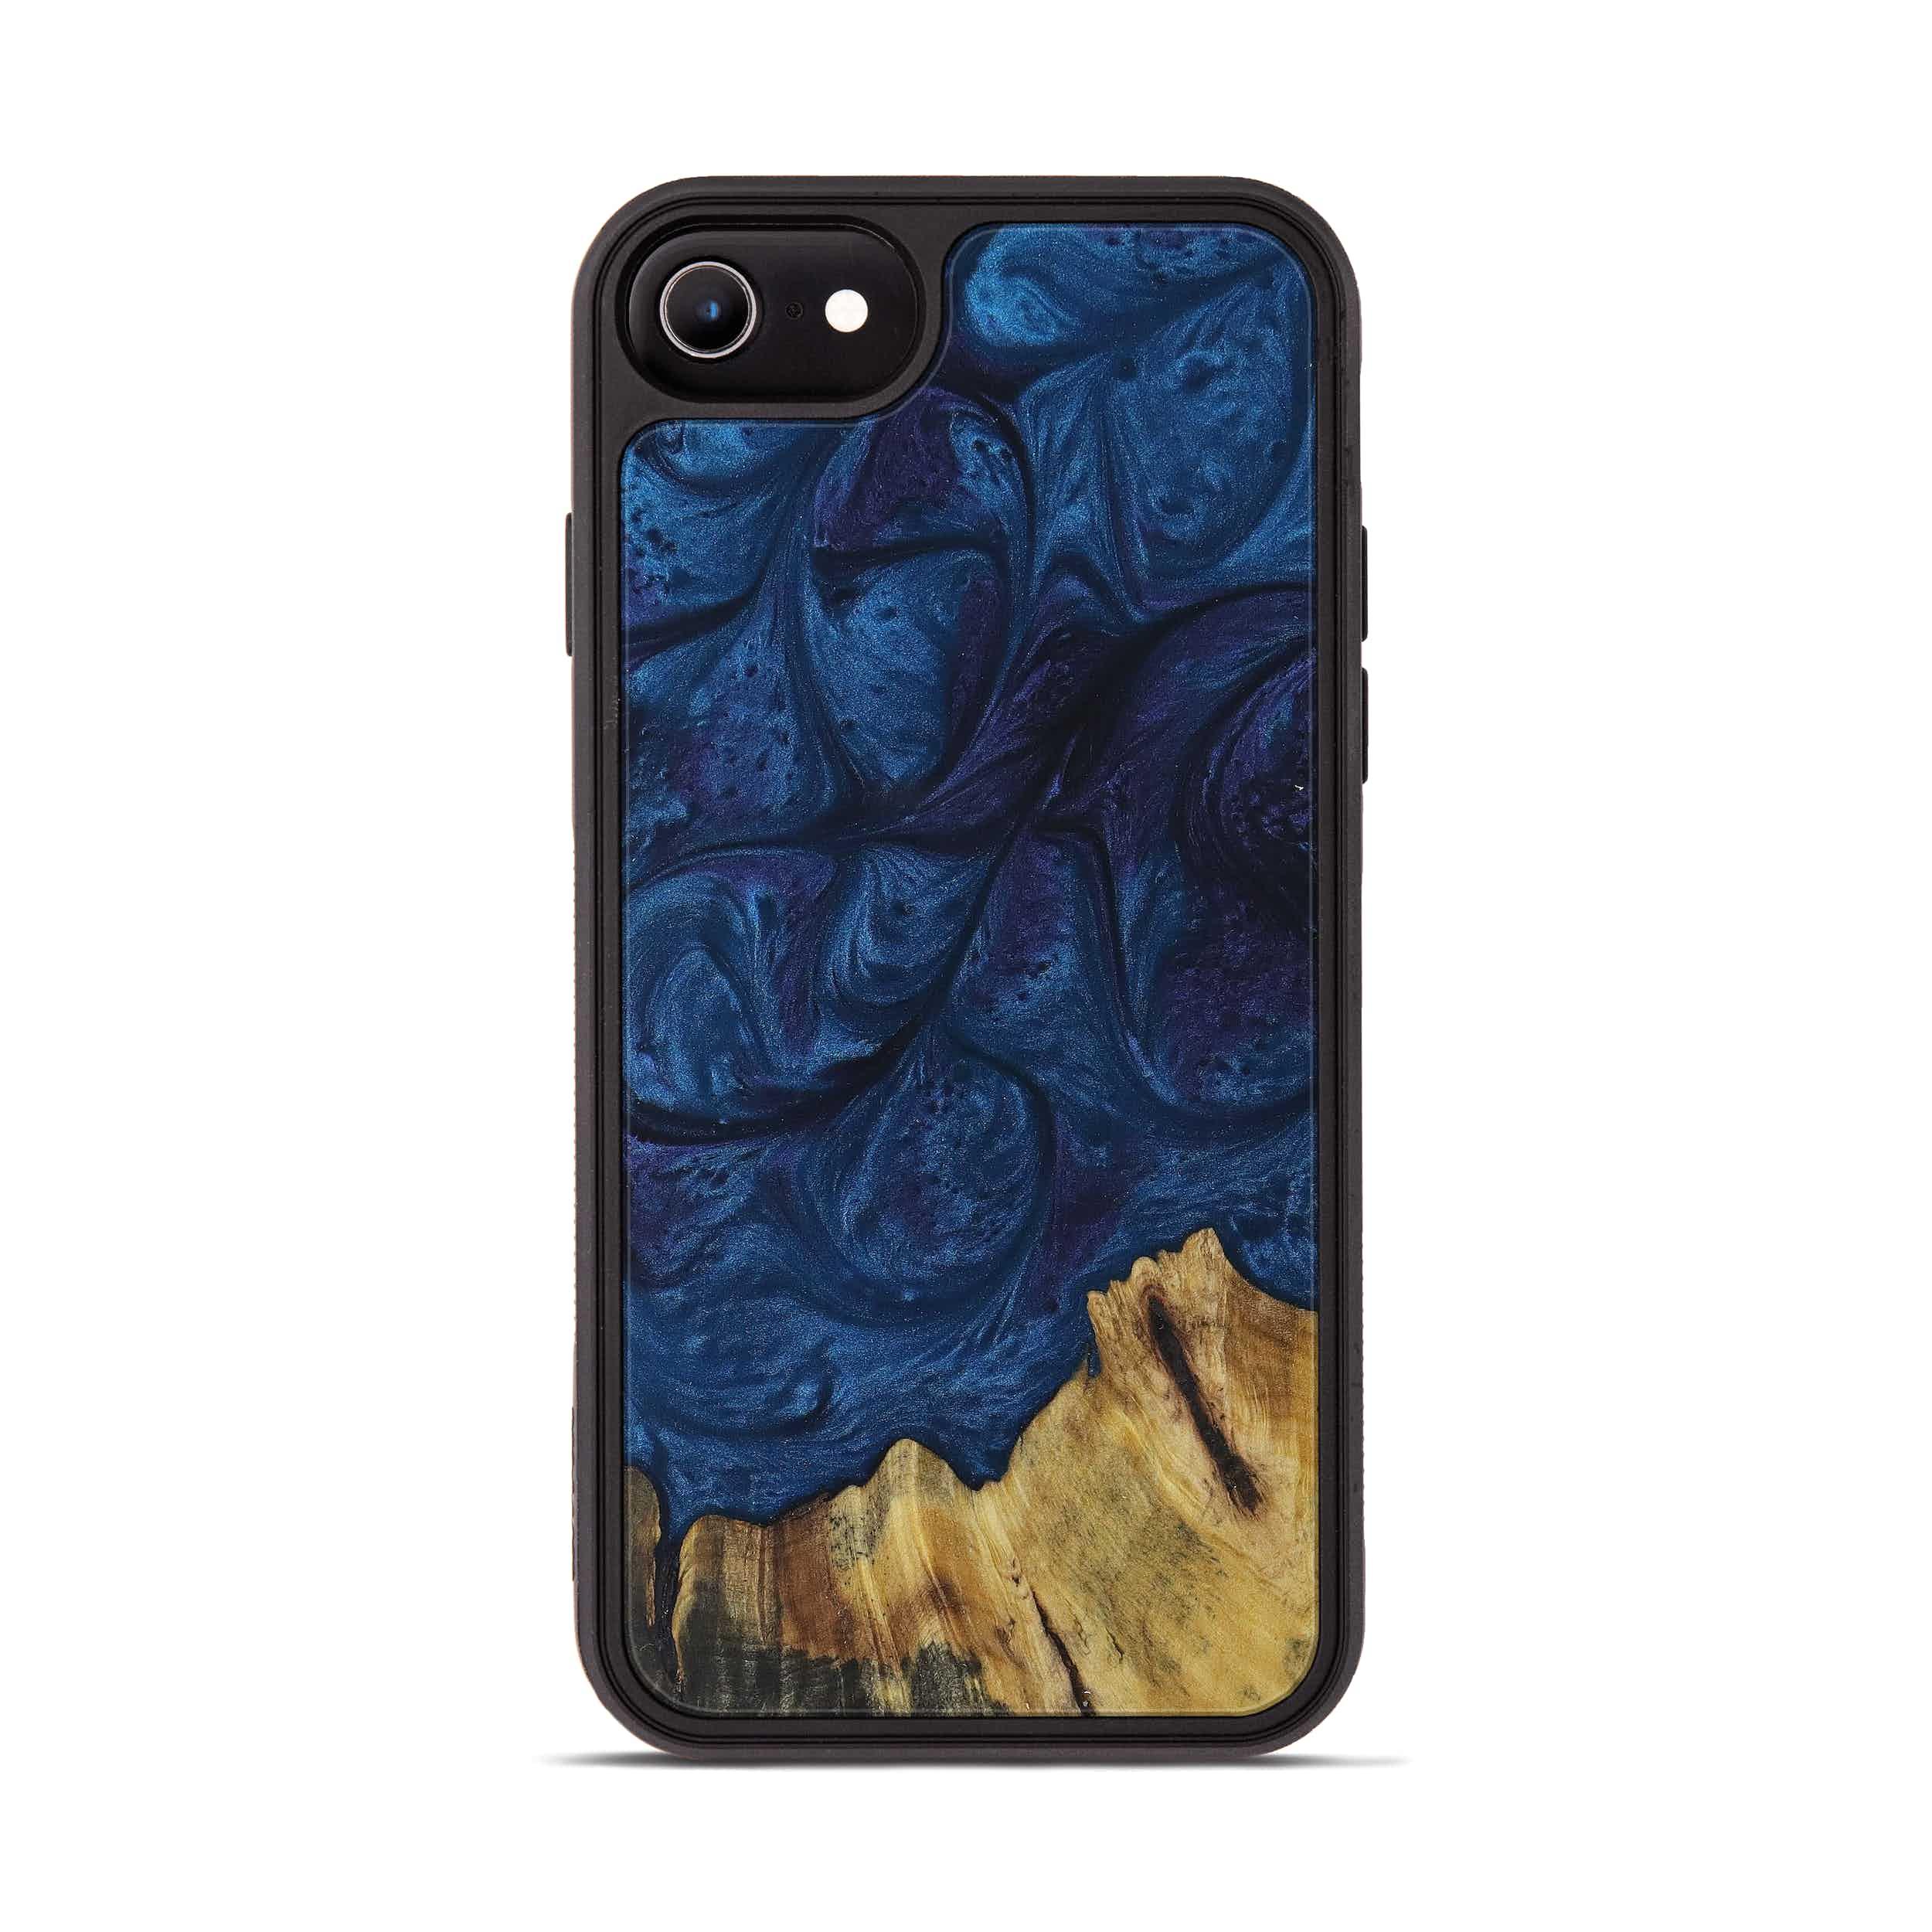 iPhone 7 Wood+Resin Phone Case - Hadria (Dark Blue, 394373)